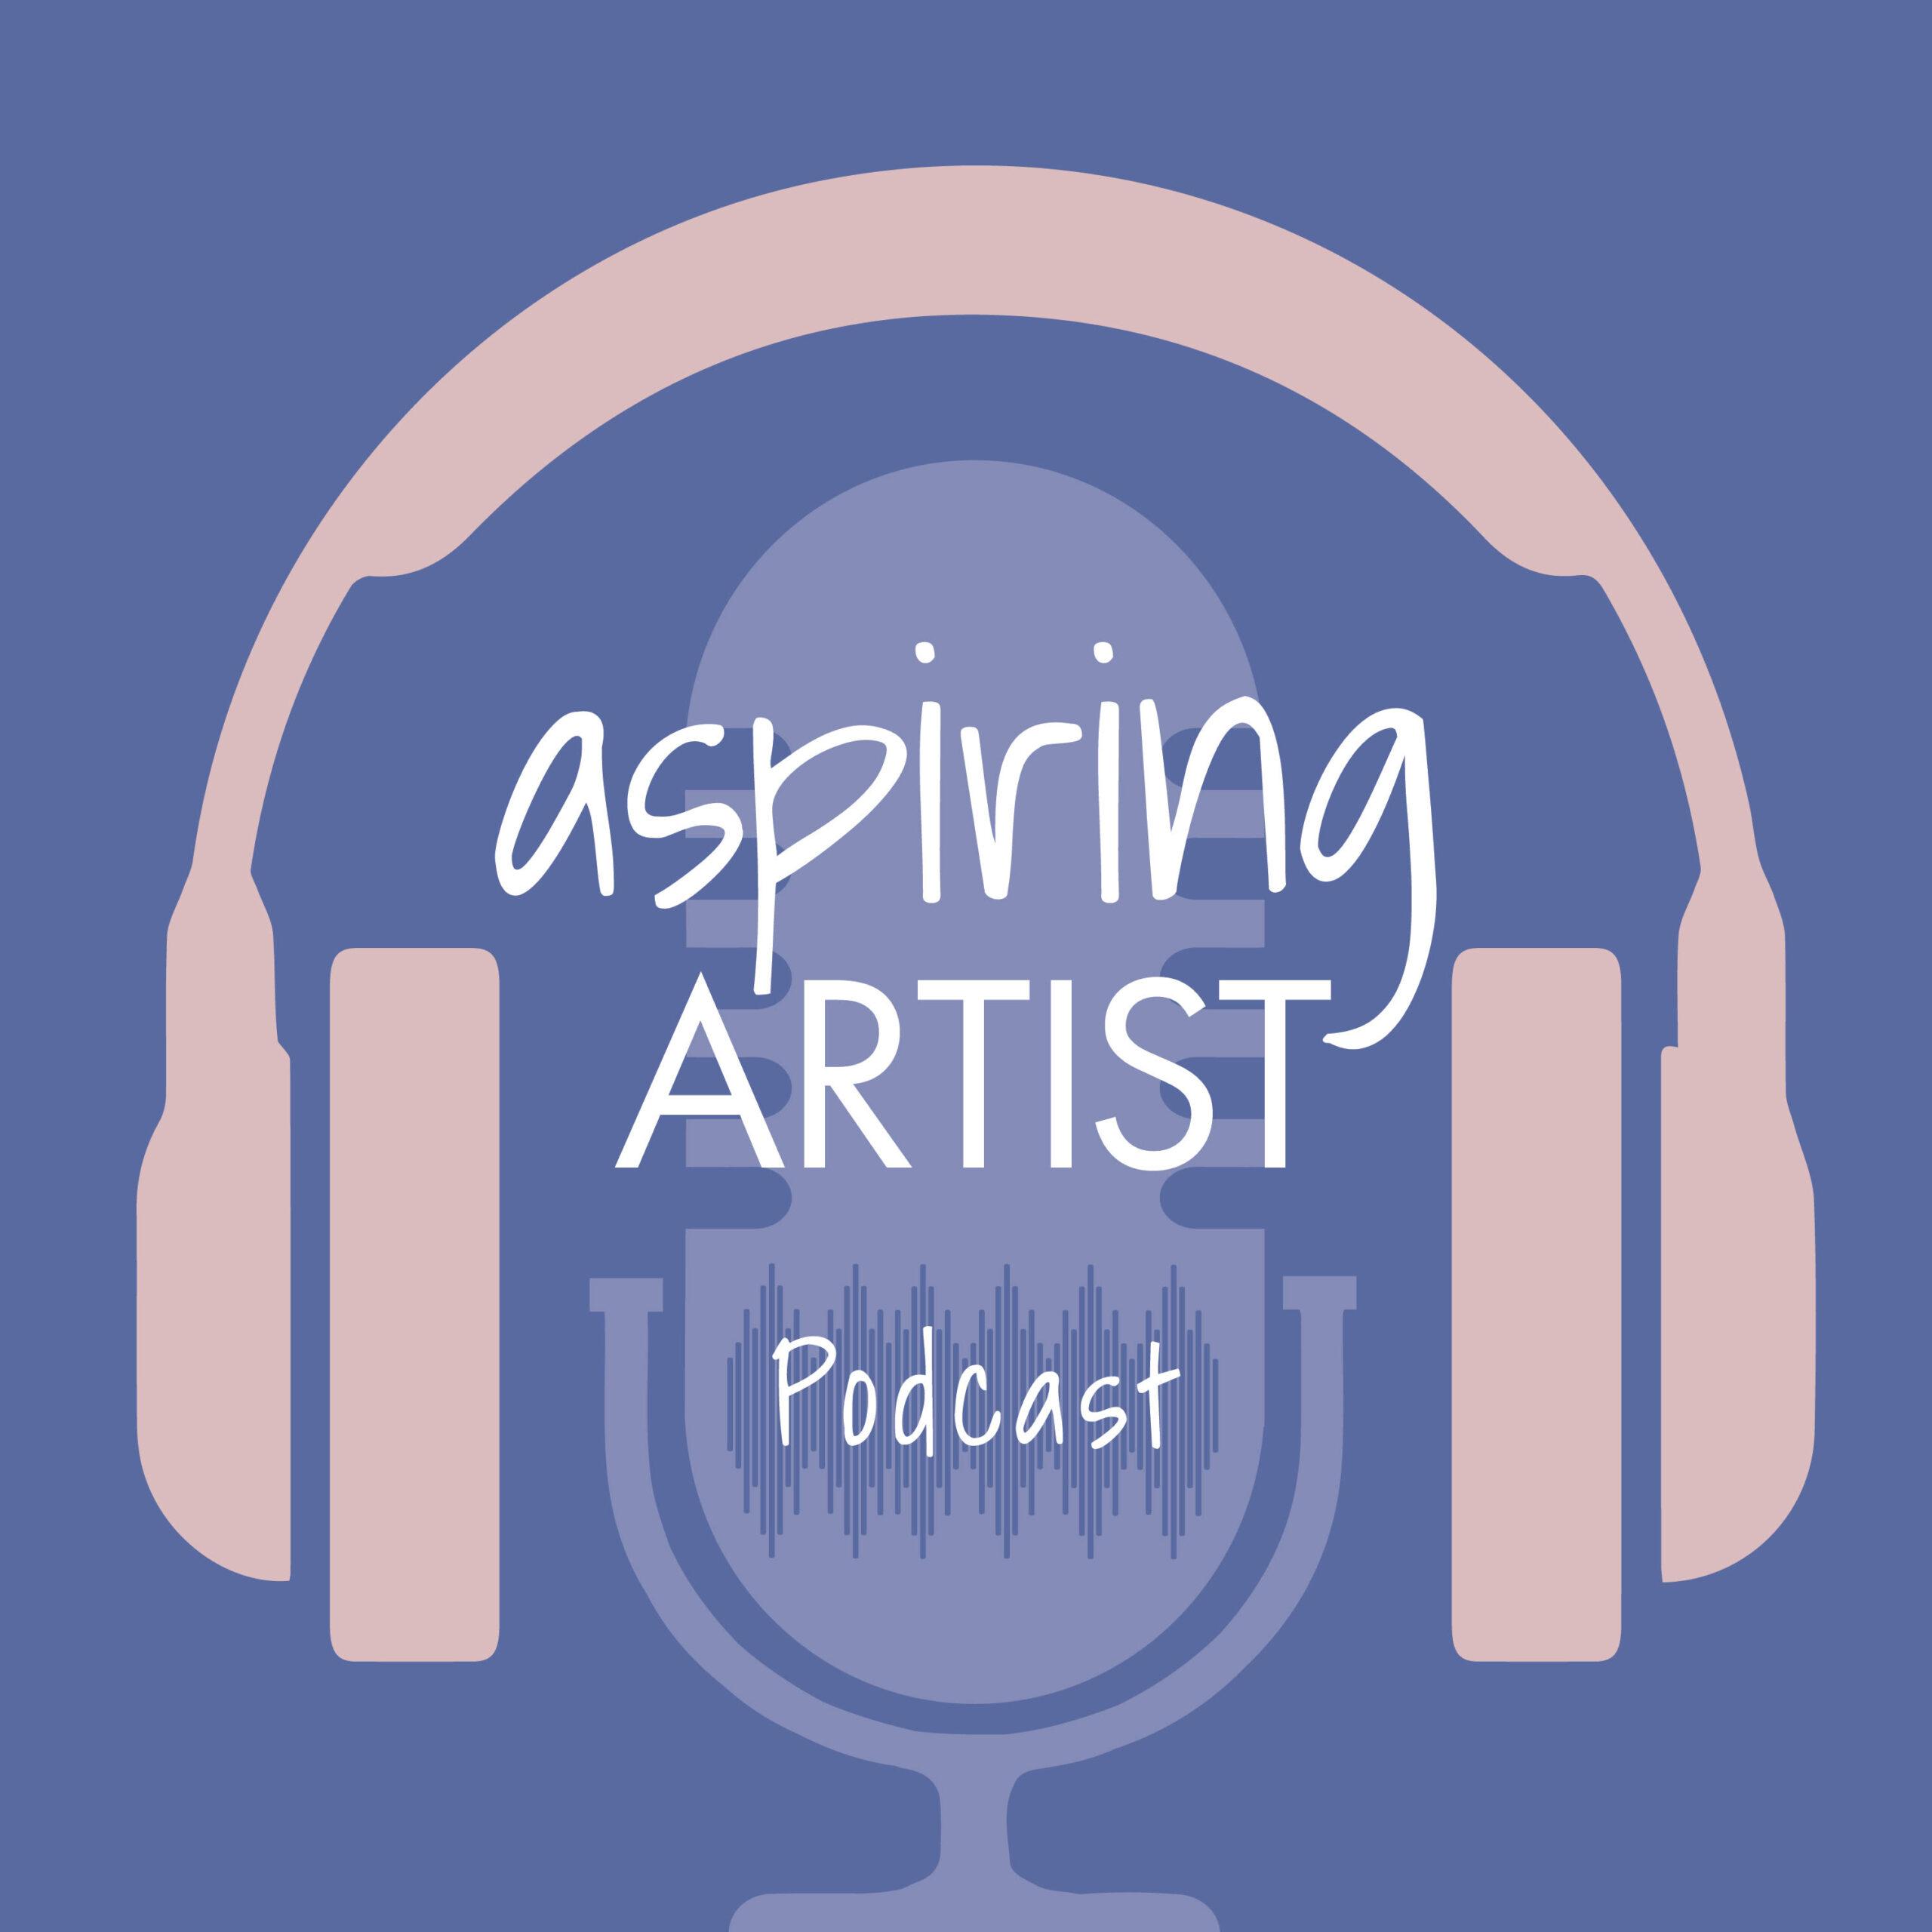 Aspiring Artist Podcast